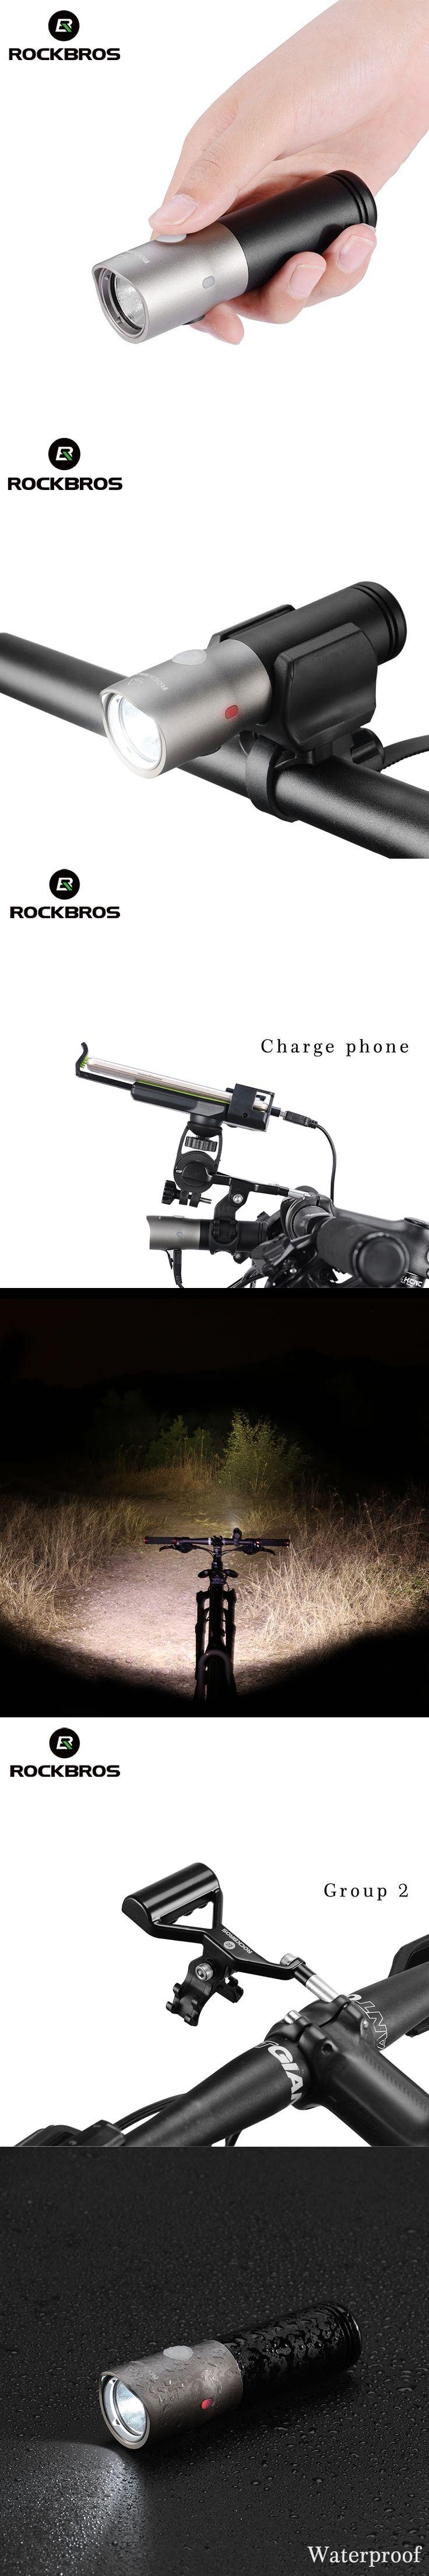 ROCKBROS 1000 Lumen Bike Bicycle Light Waterproof IPX6 USB Rechargeable 18650 3000 mAh Power LED Bank Flashlight MTB Accessories